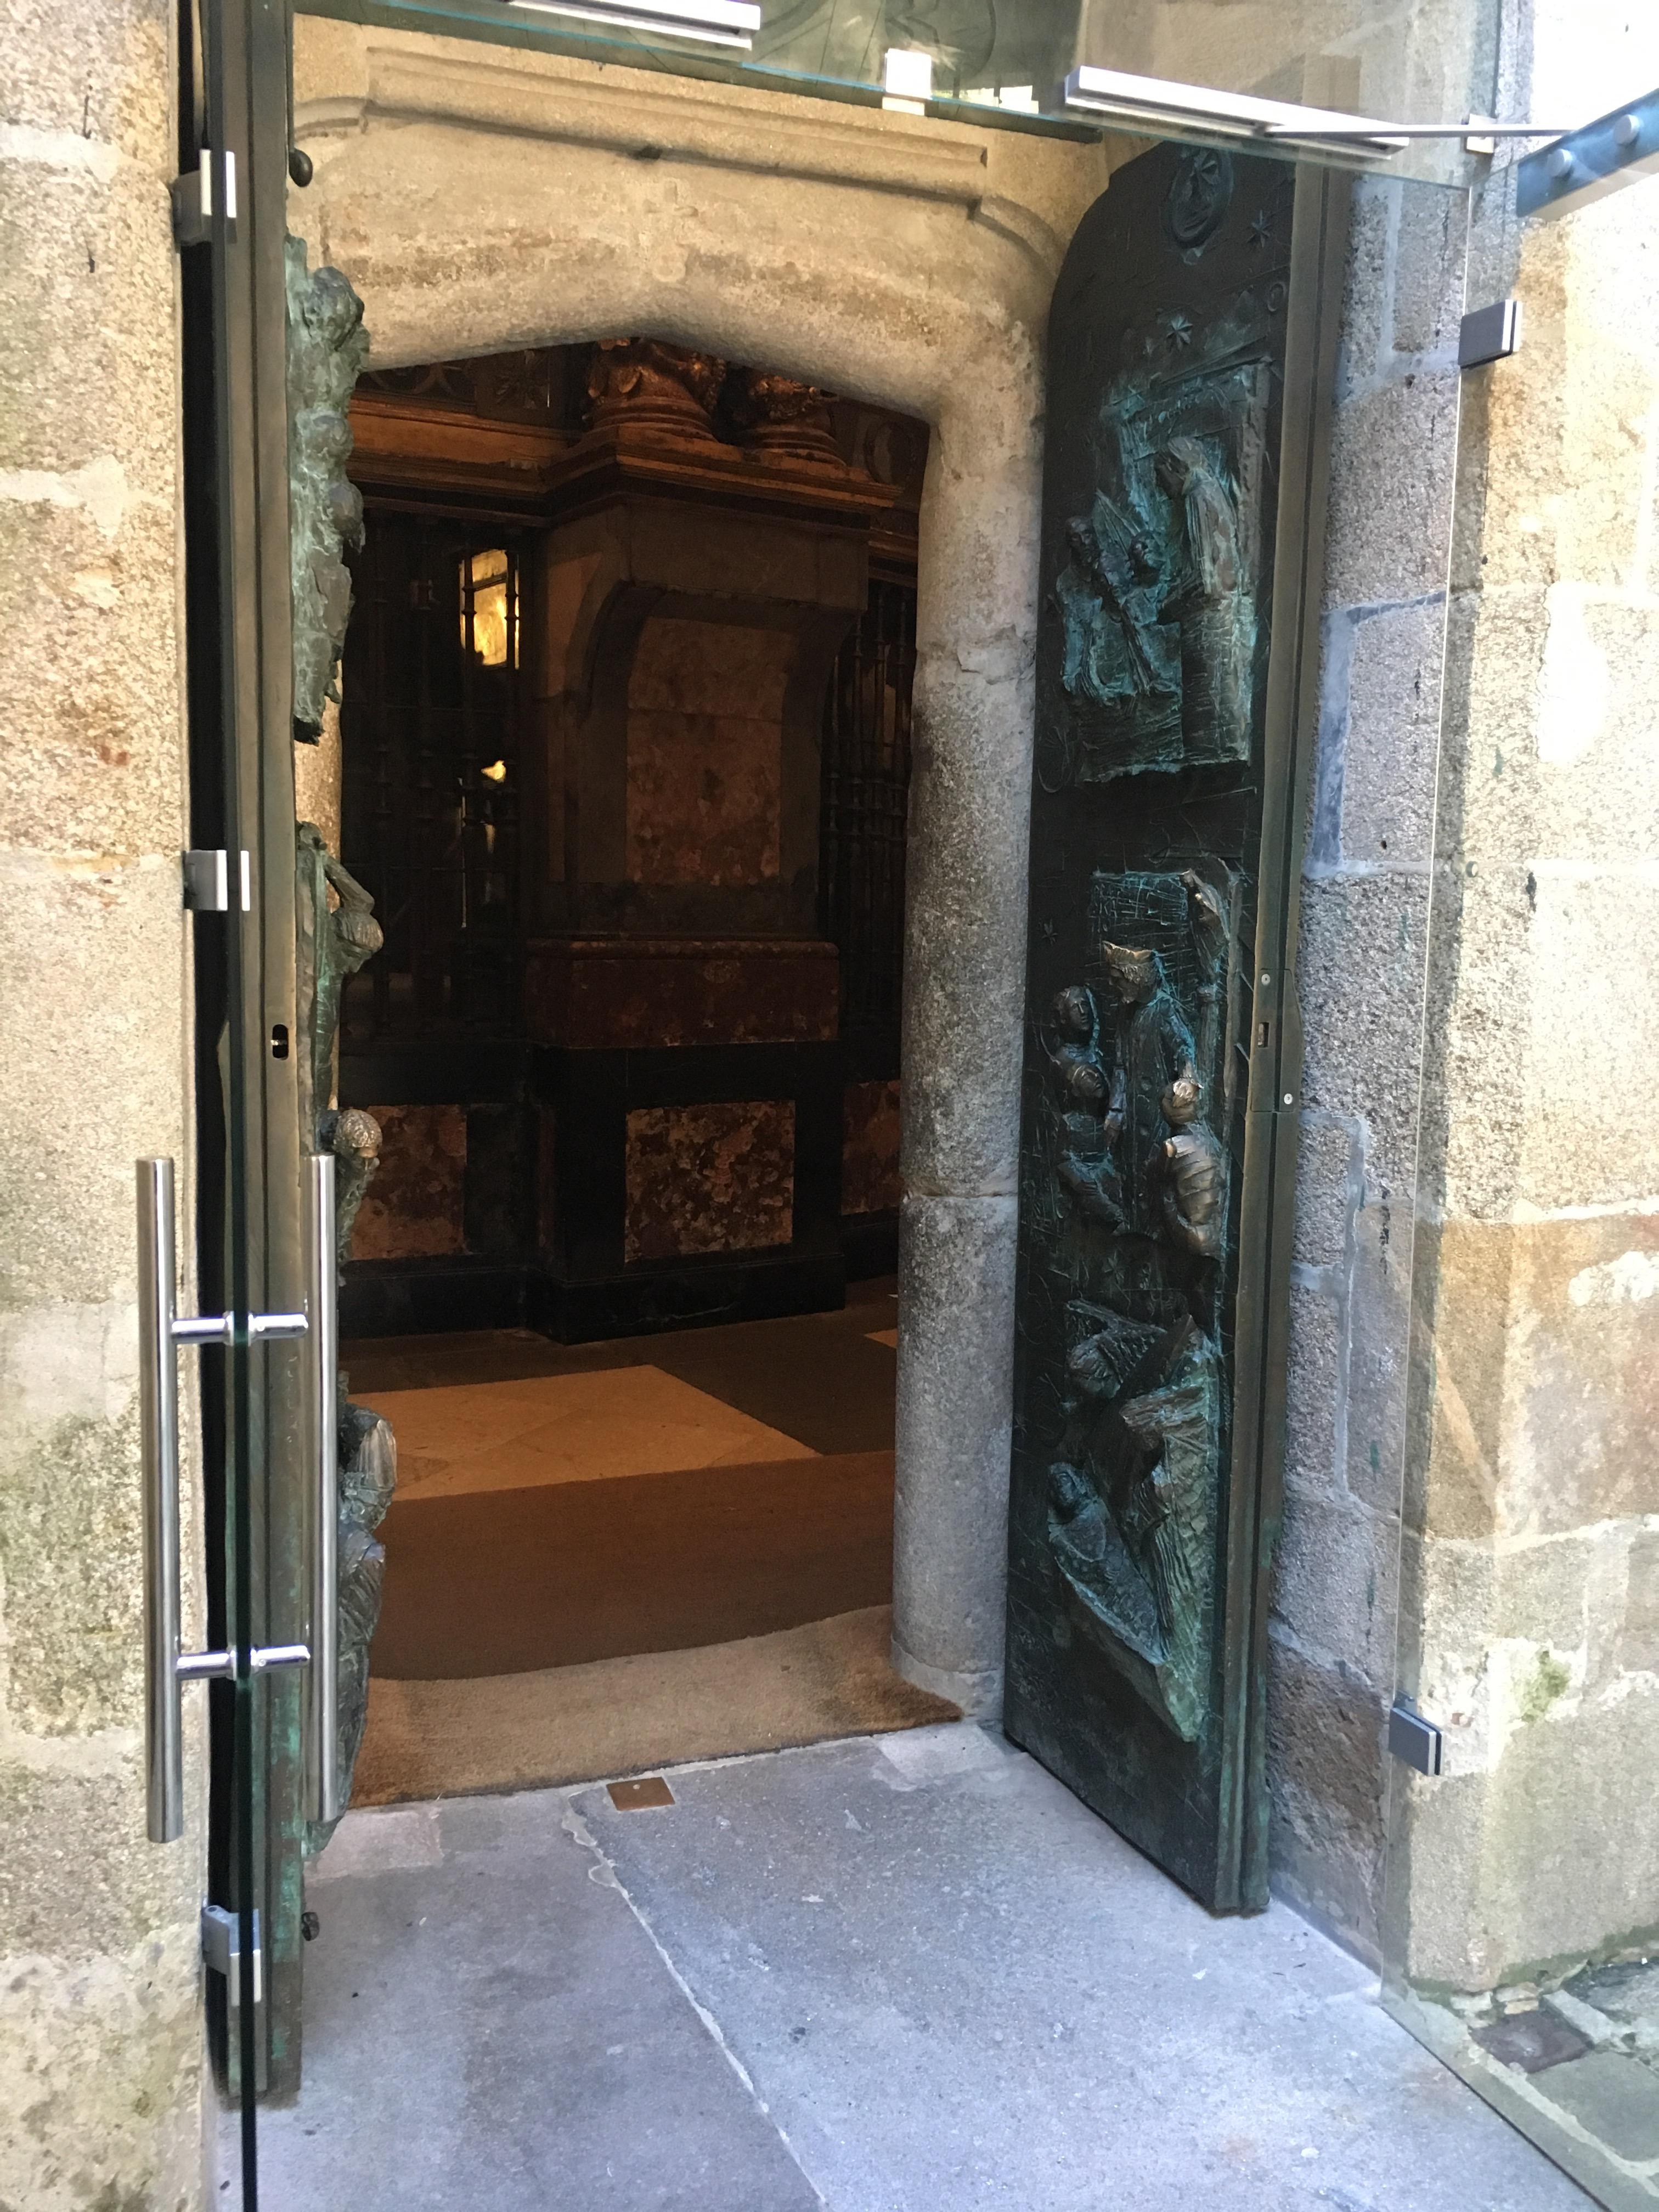 19. Santiago de Compostela - Spain